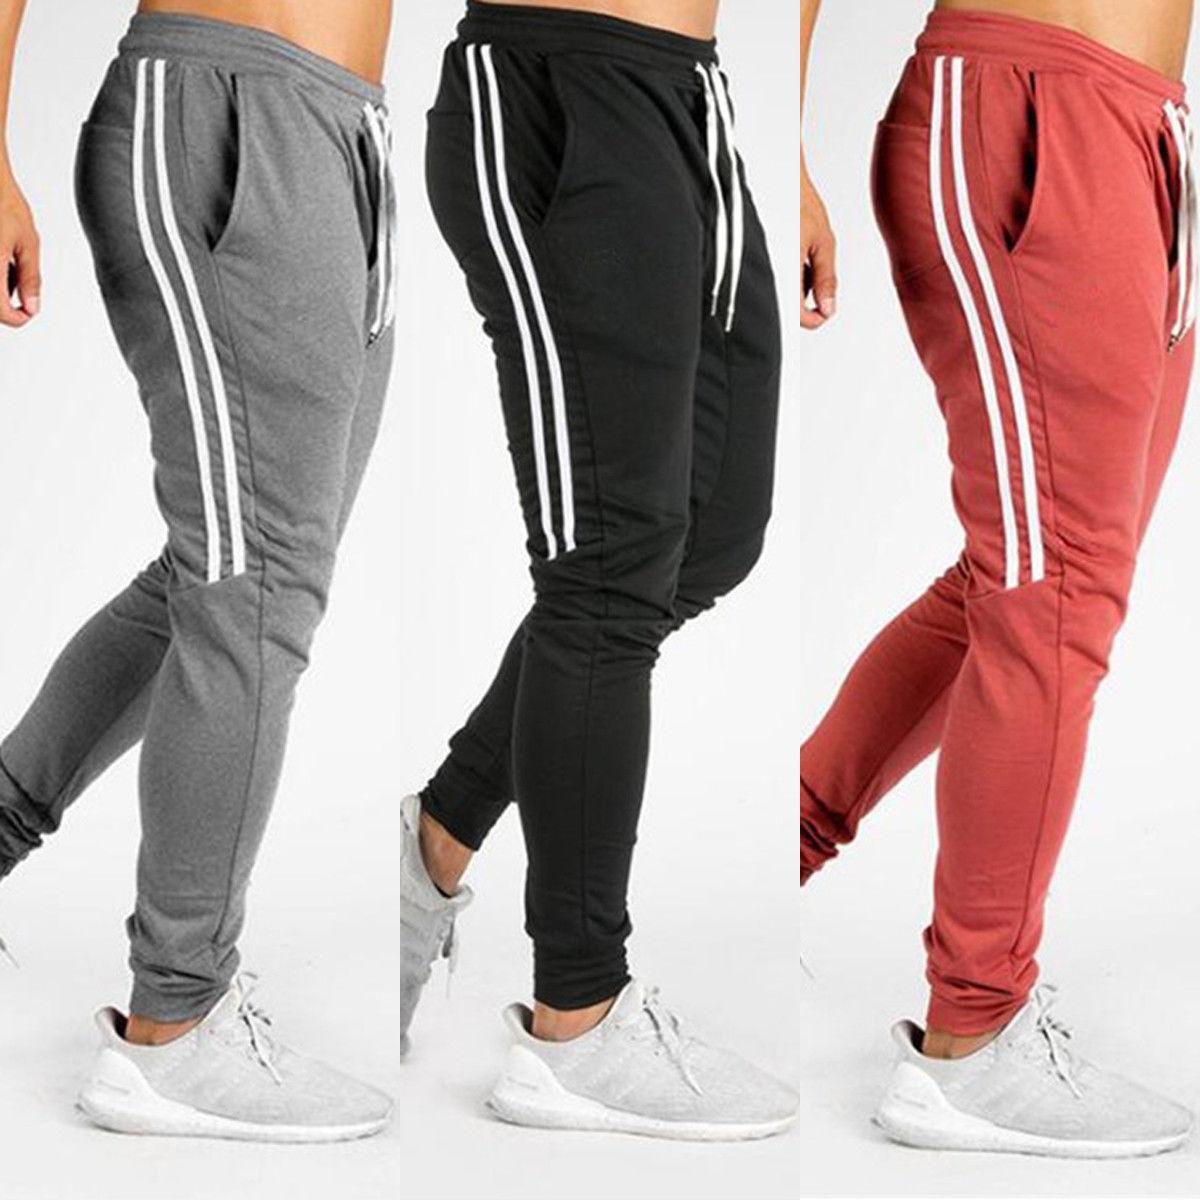 Pantalones informales largos para hombre, pantalones ajustados Jogge, pantalones de chándal de buena calidad, pantalones informales para hombre